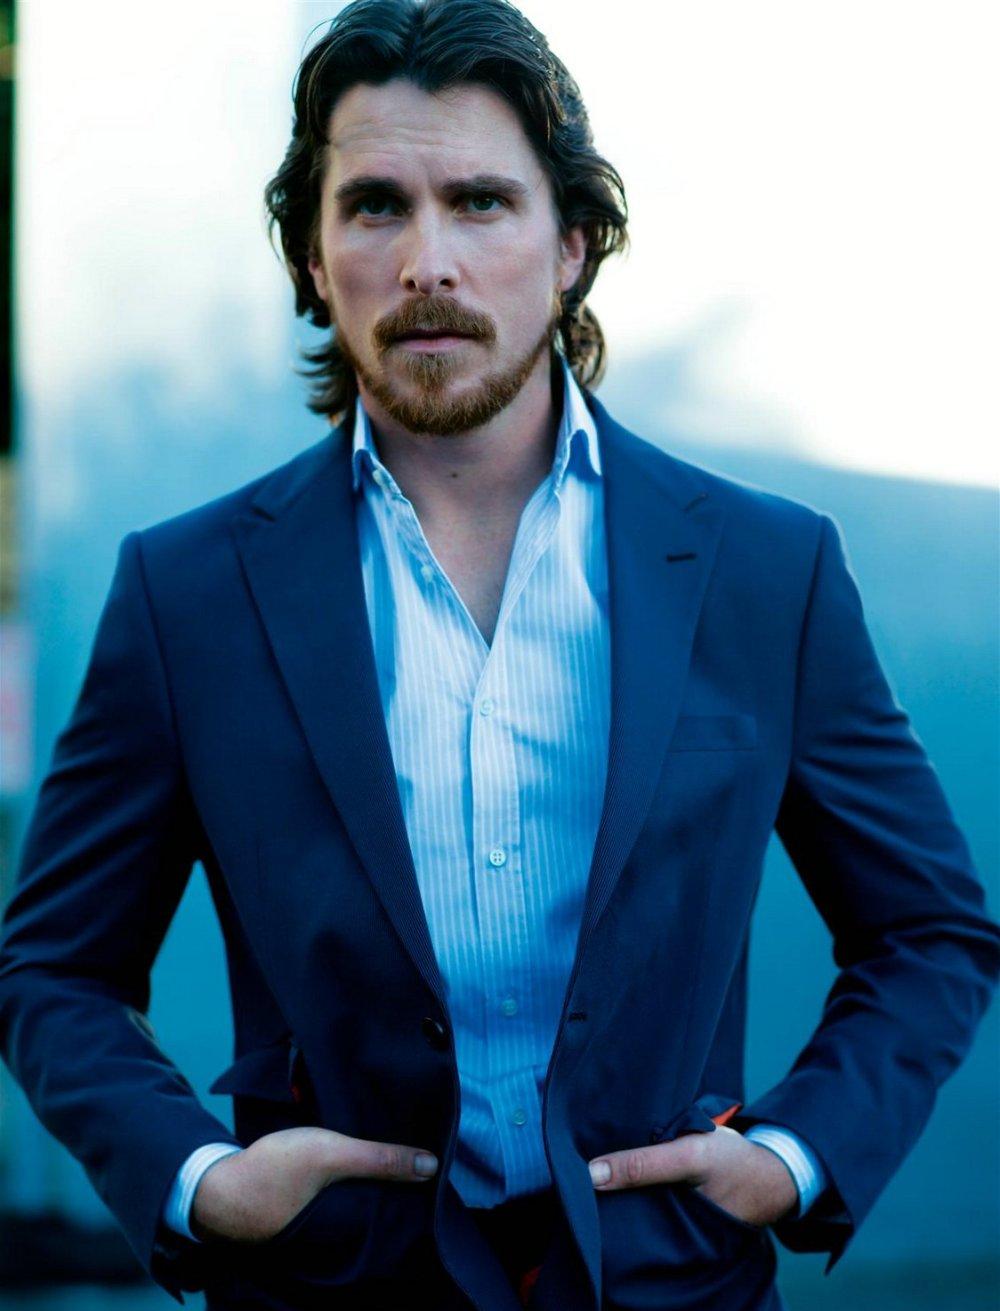 Amazoncom The Dark Knight Rises Christian Bale Michael